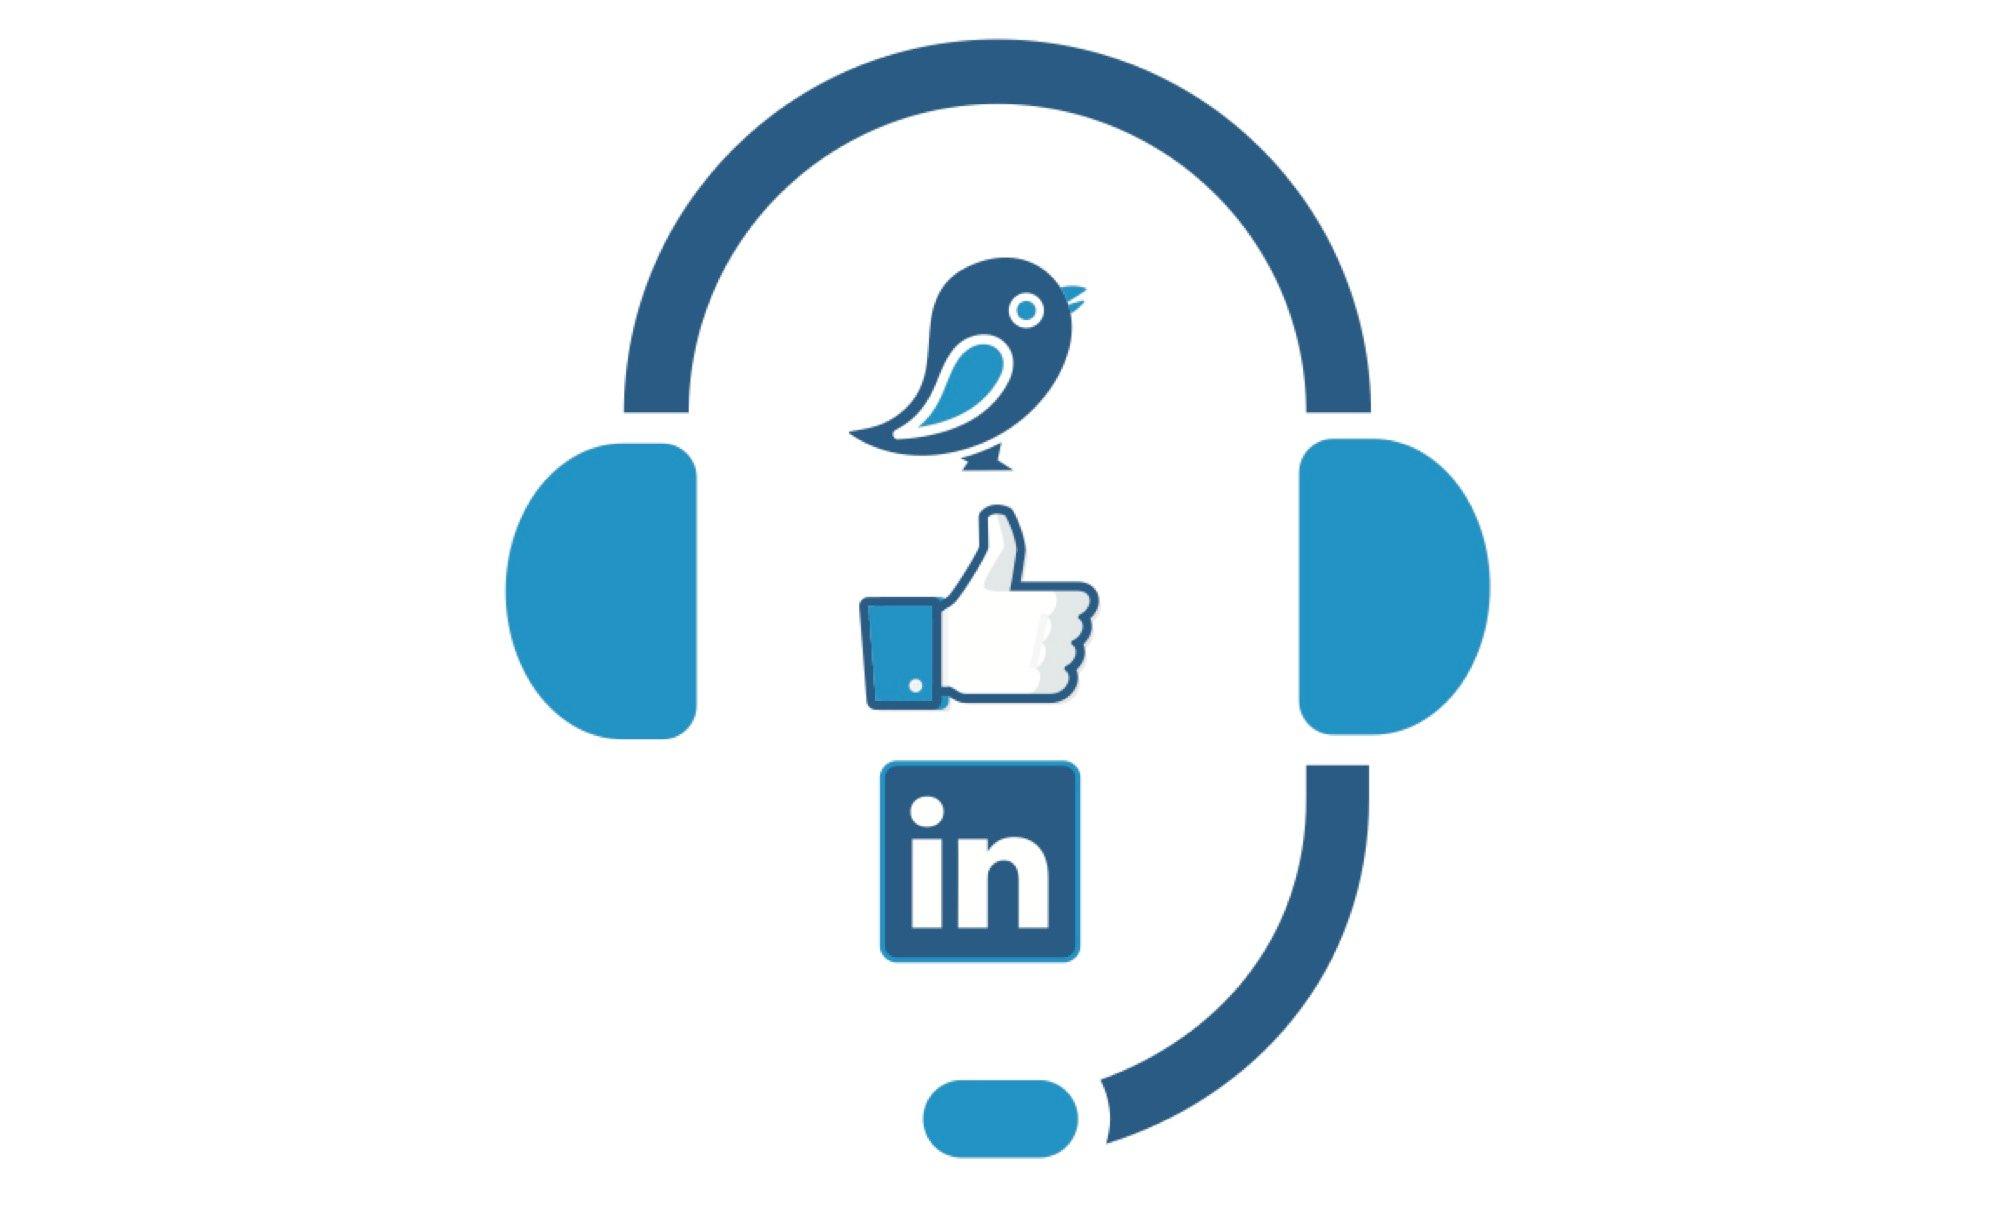 social-customer-service-image.jpg